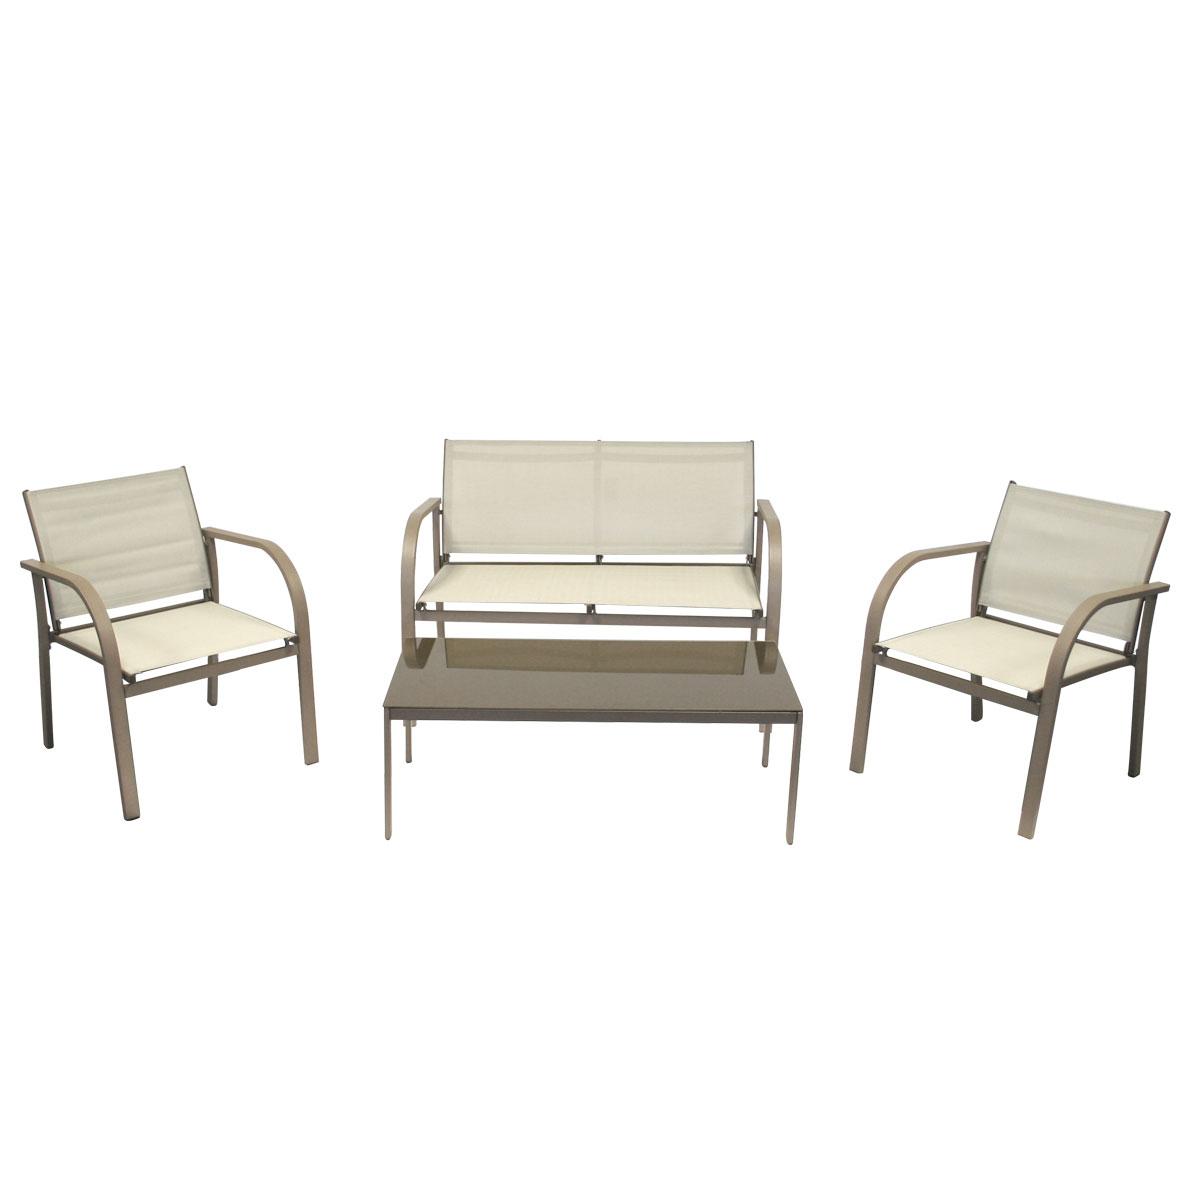 Moderno Muebles De Comedor Bentley Modelo - Muebles Para Ideas de ...